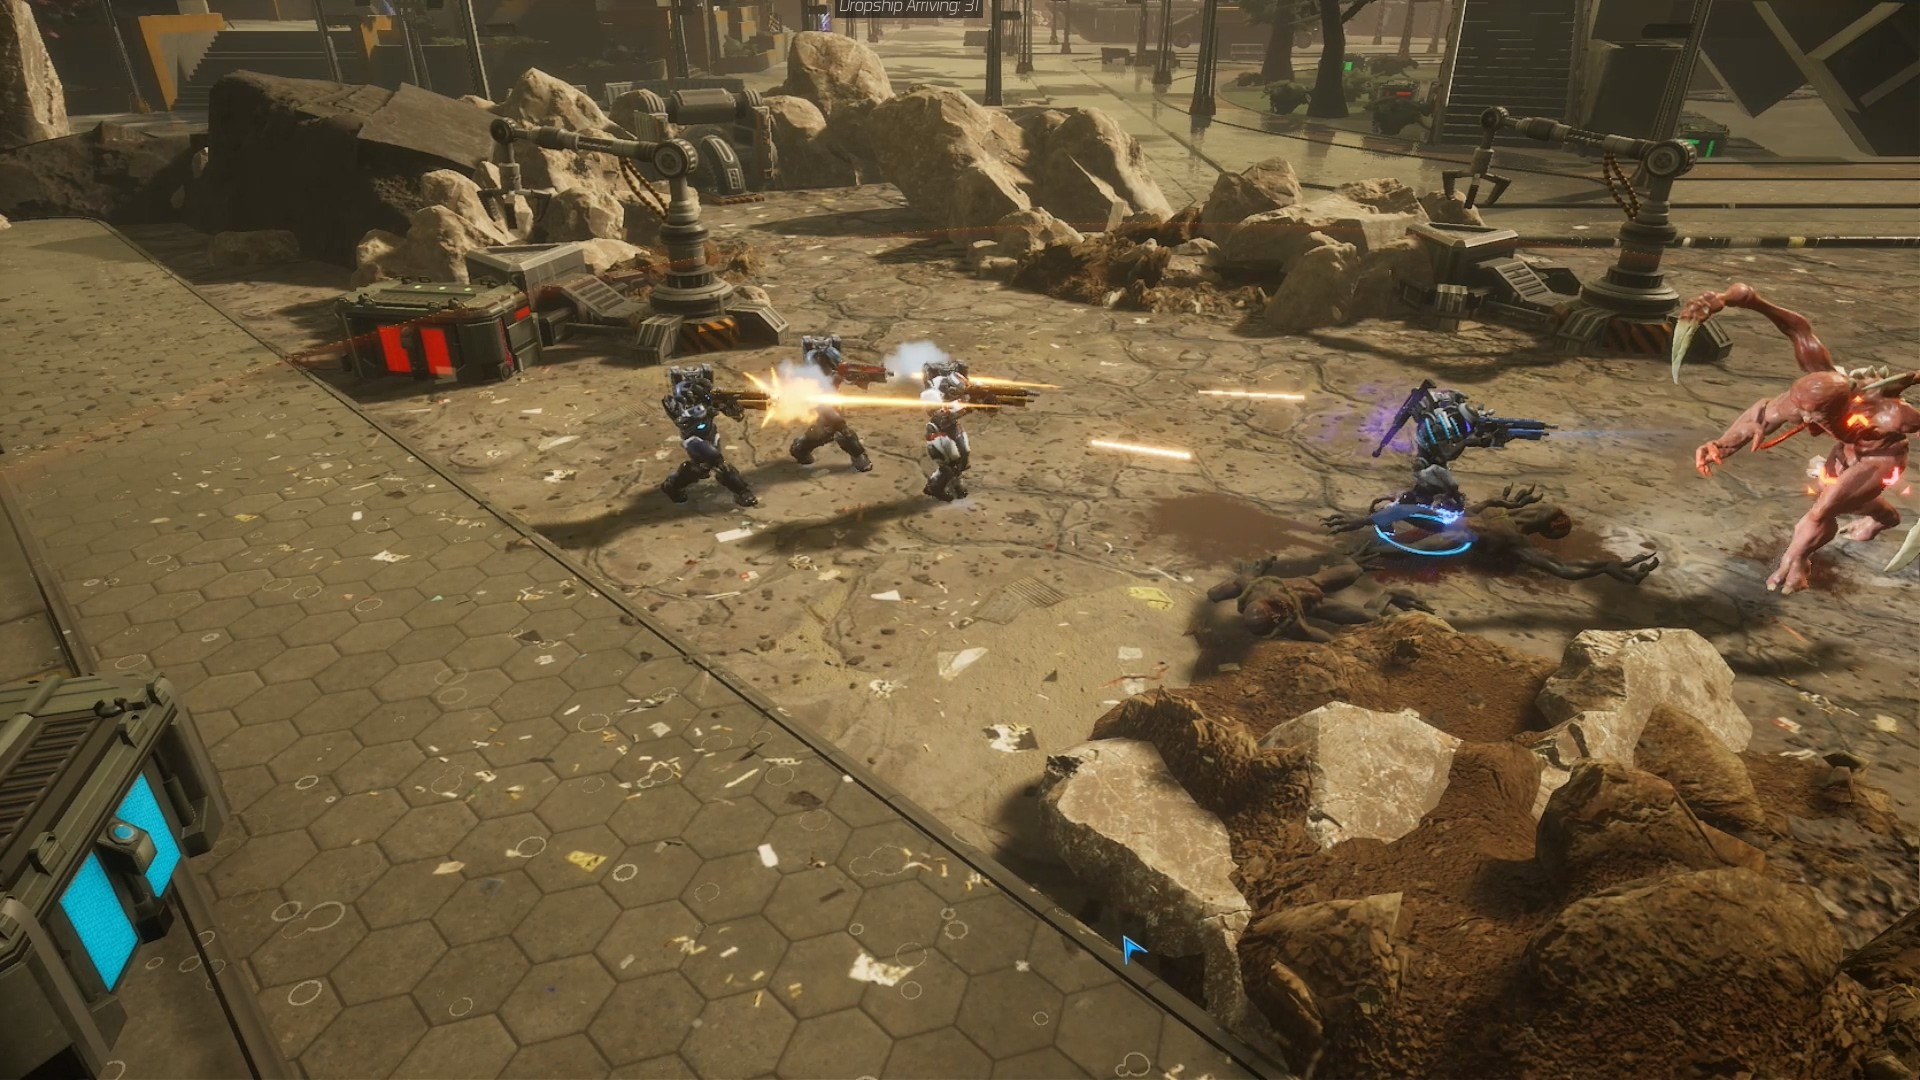 red-soltice-2-survivors-pc-screenshot-1